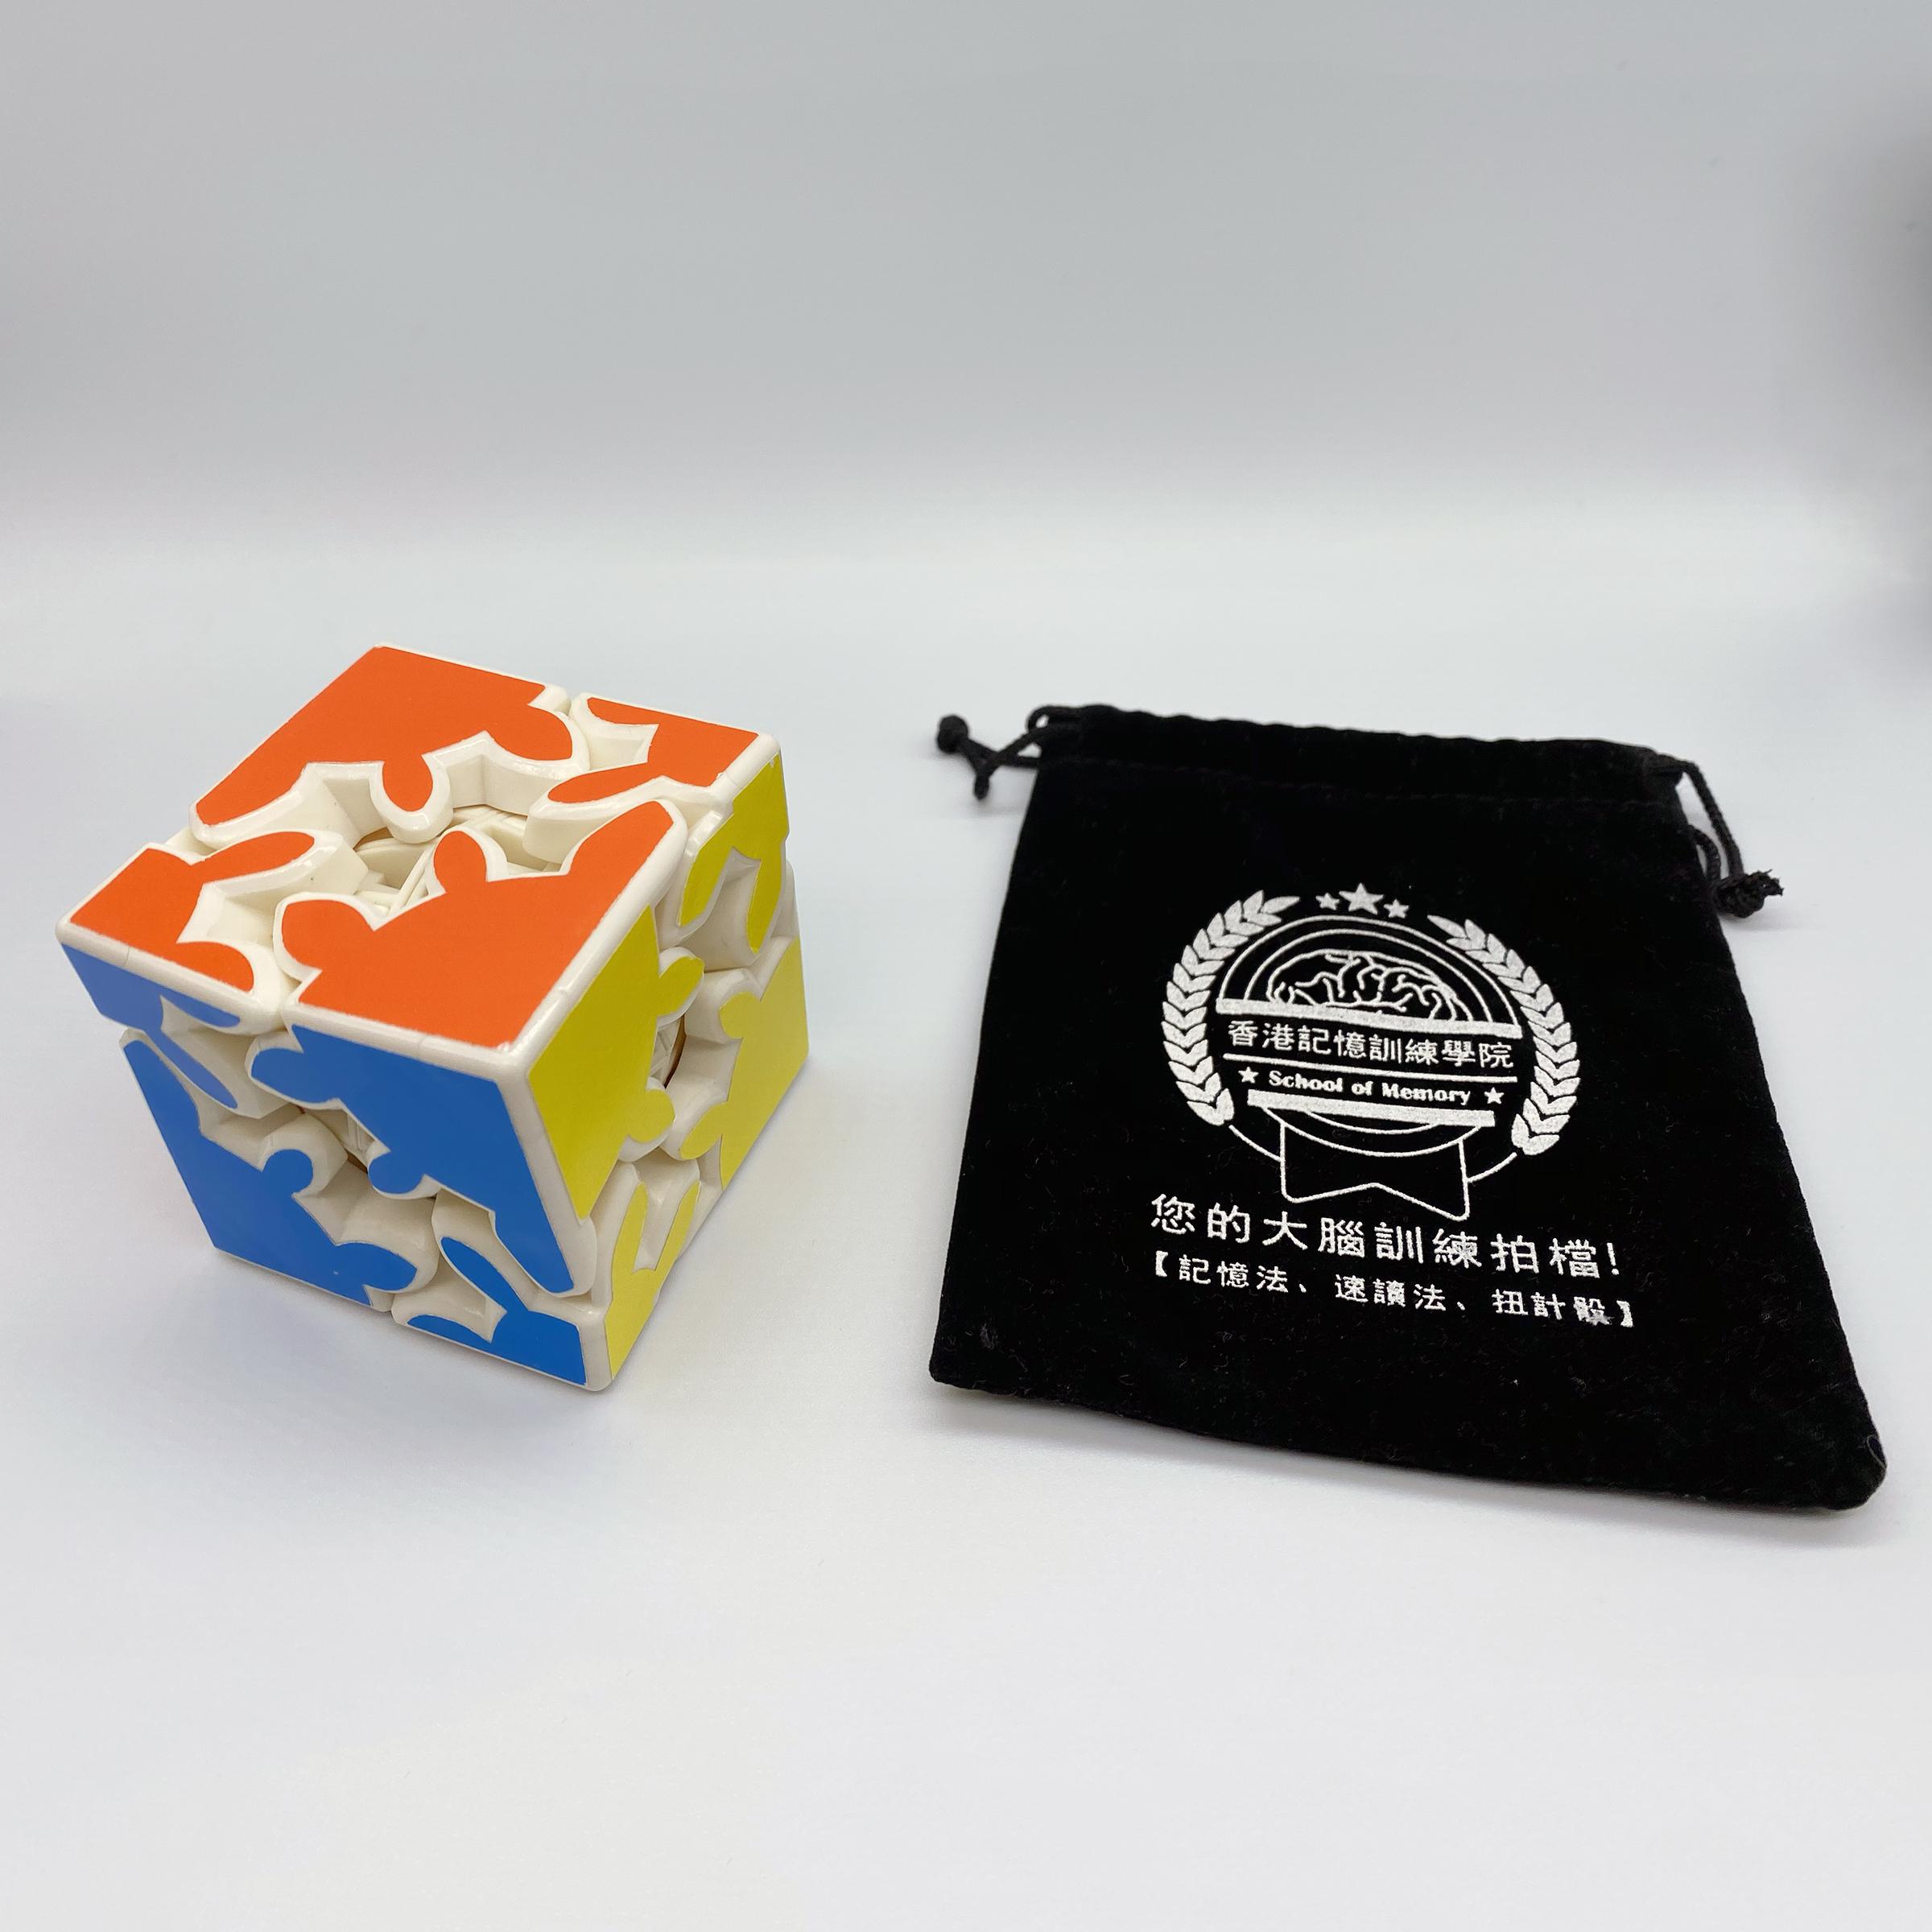 Gear Shift Cube 二階齒輪扭計骰